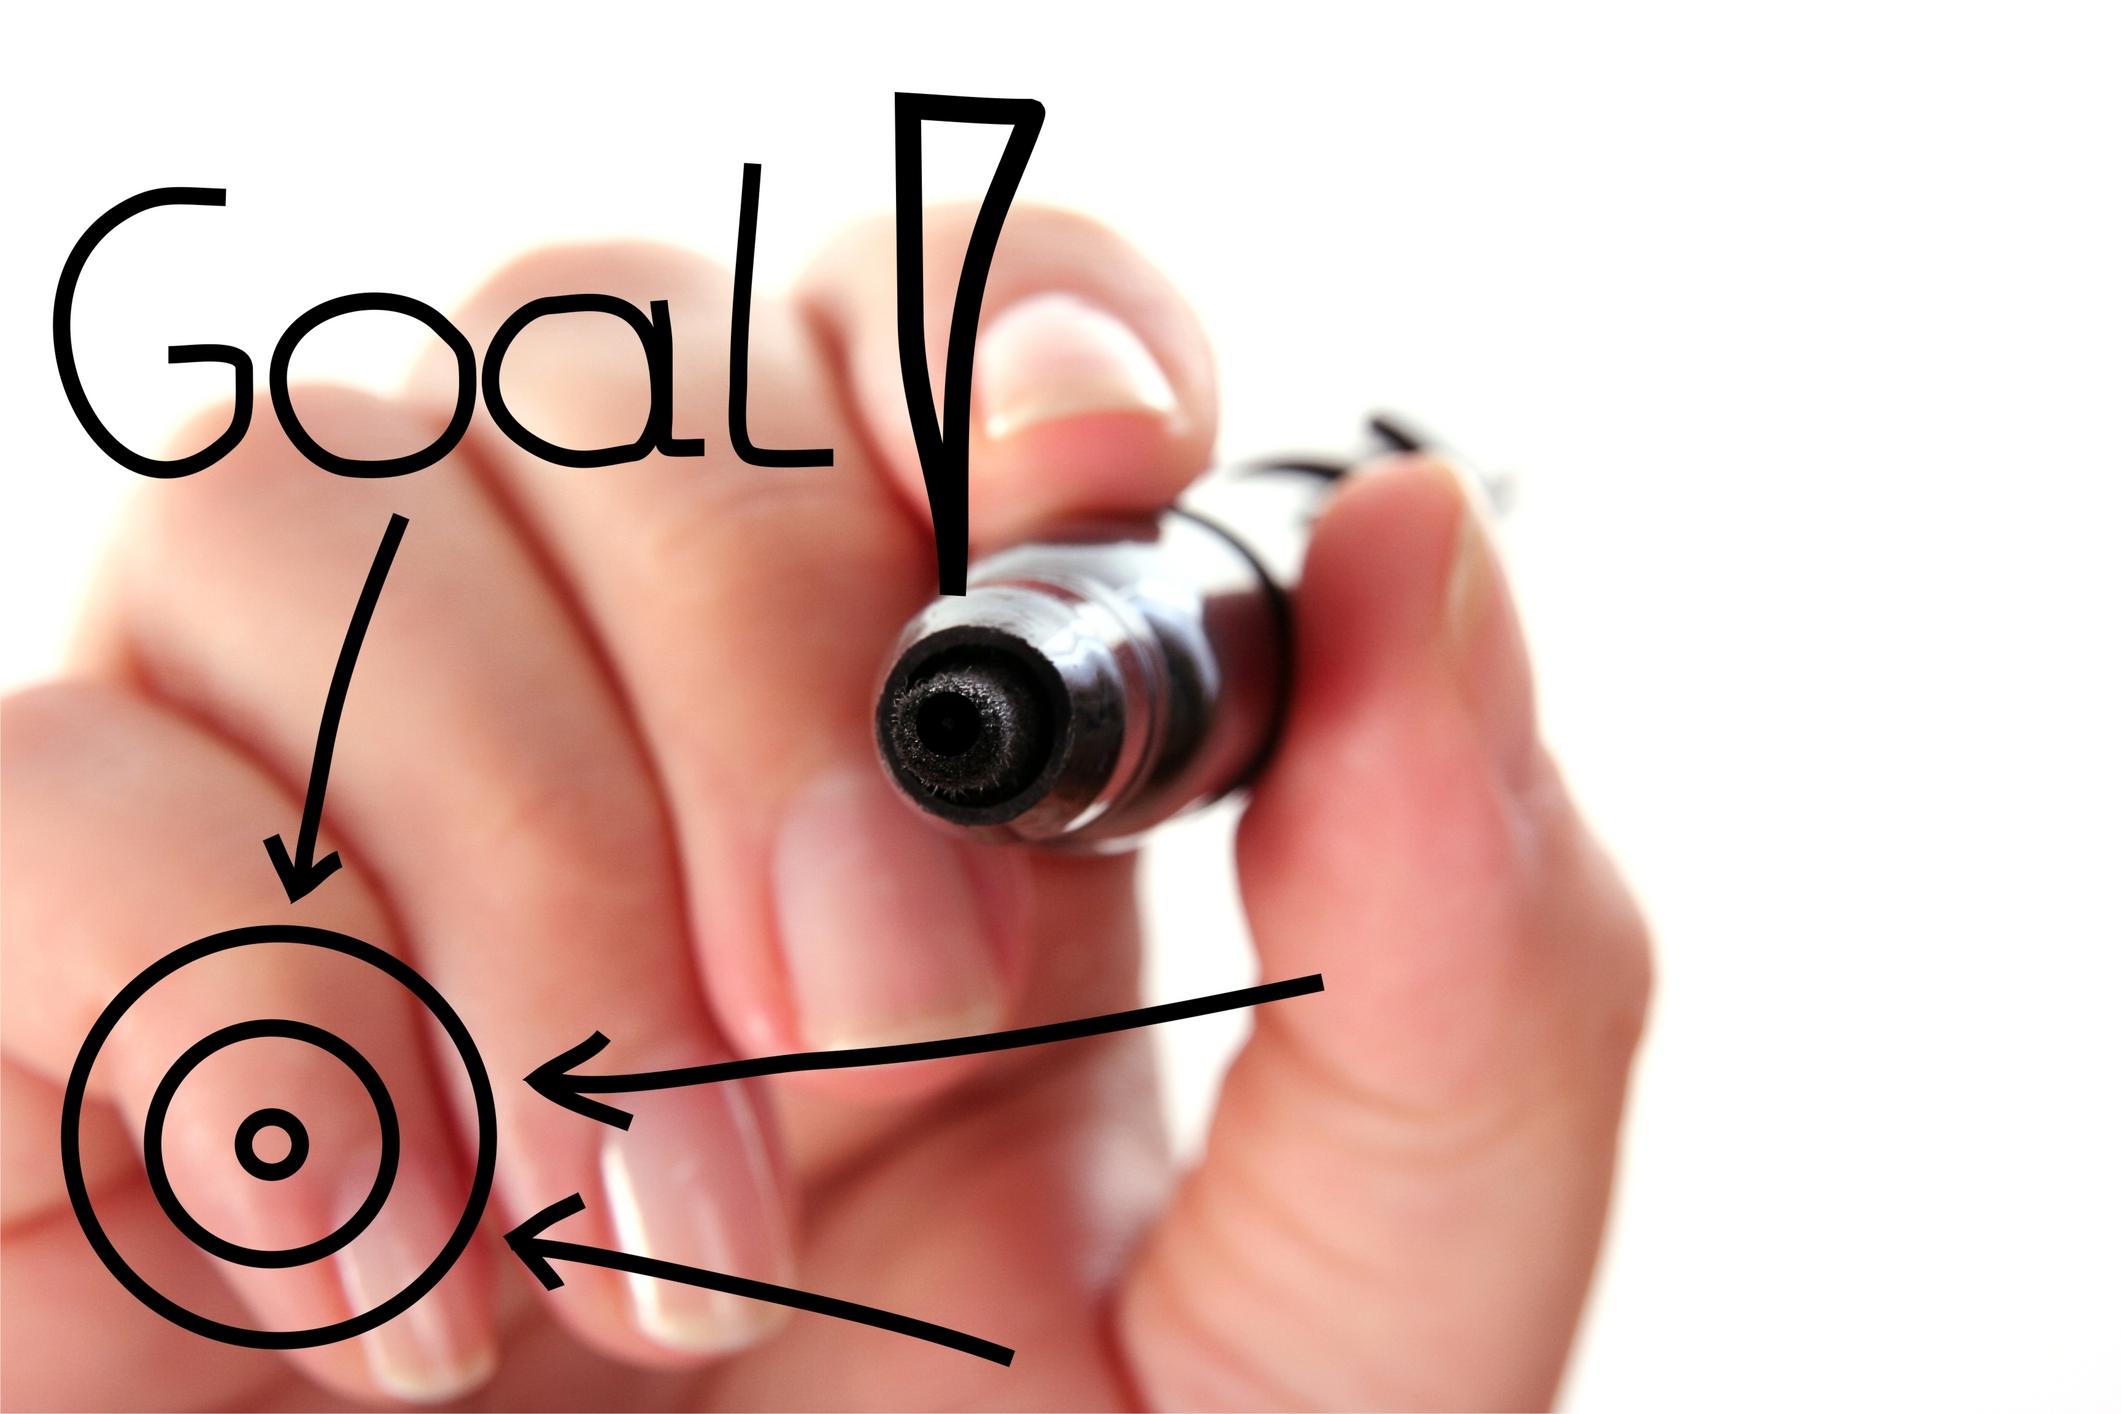 goal.jpg?width=300